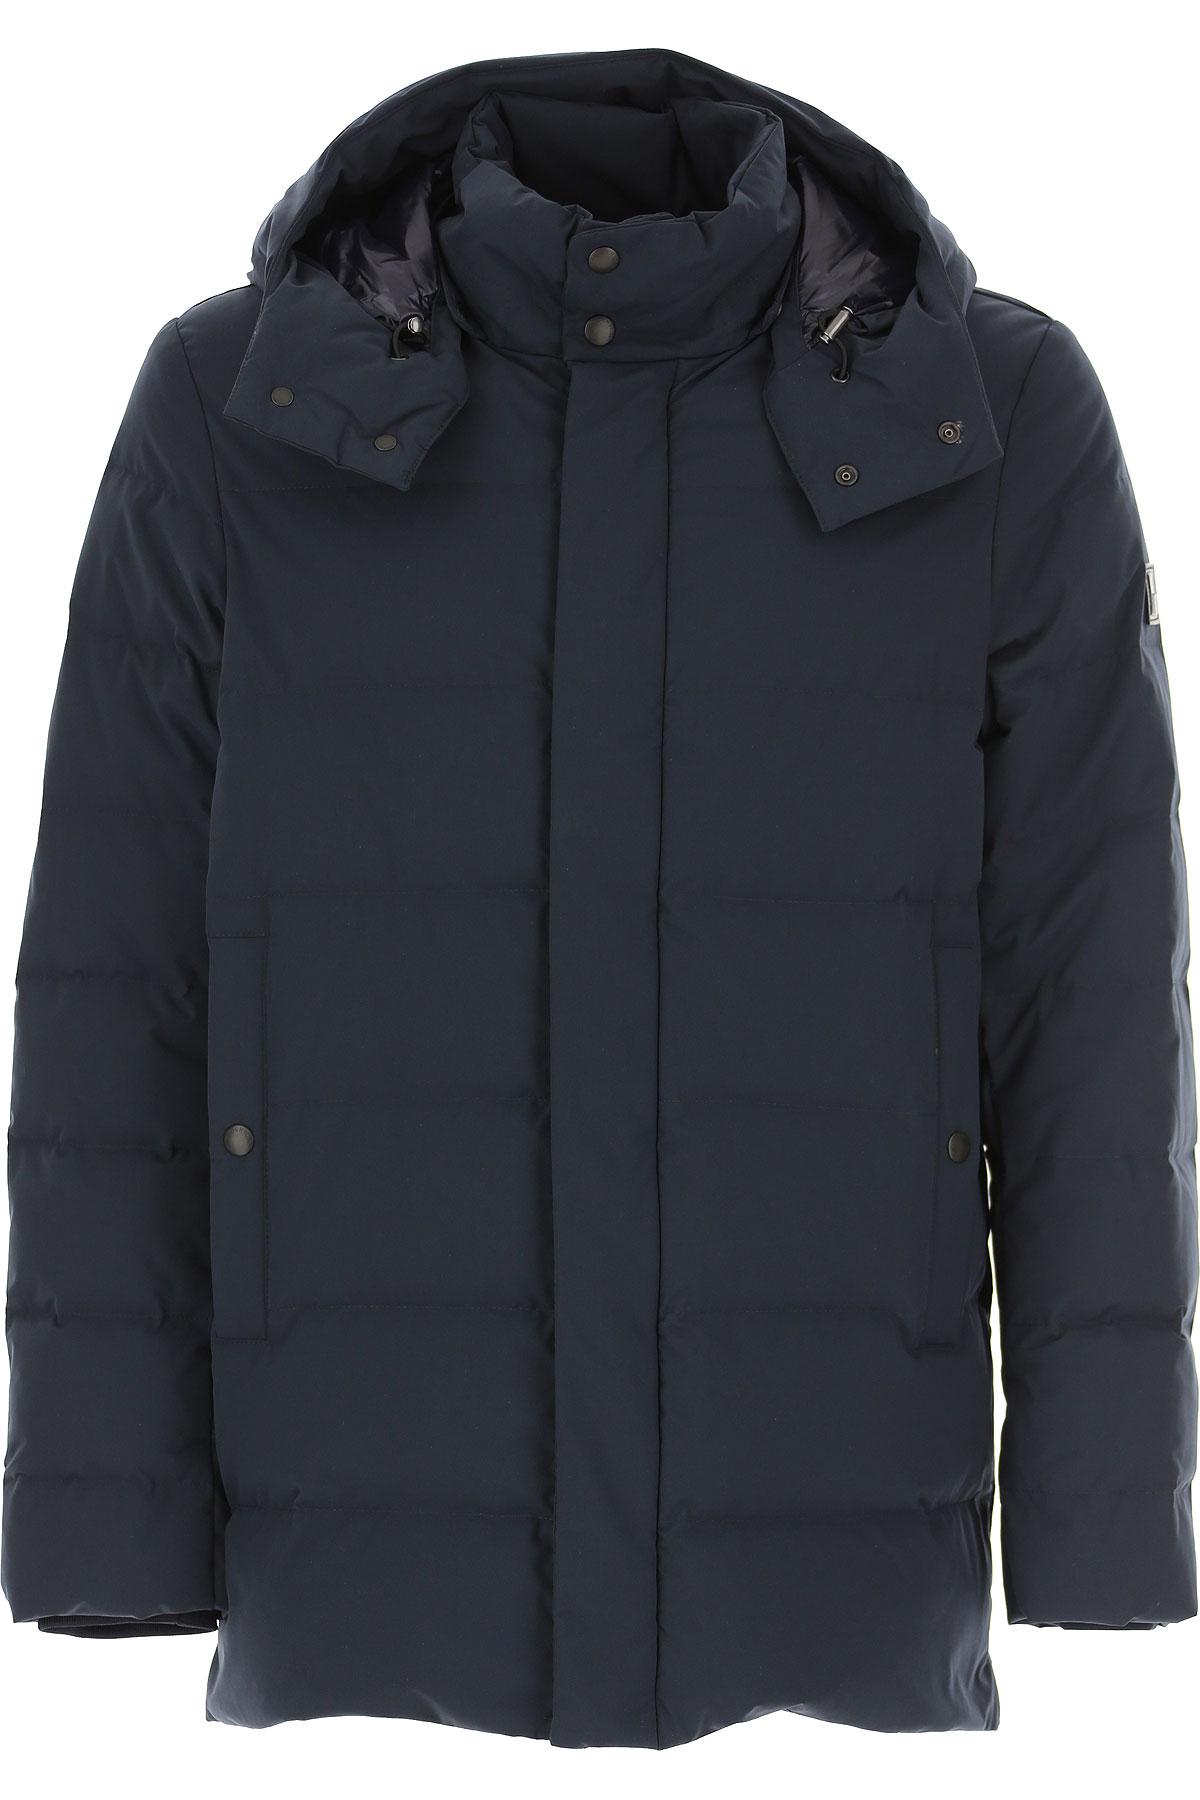 Woolrich Down Jacket for Men, Puffer Ski Jacket, Melton Blue, polyester, 2019, L M S XL XXL